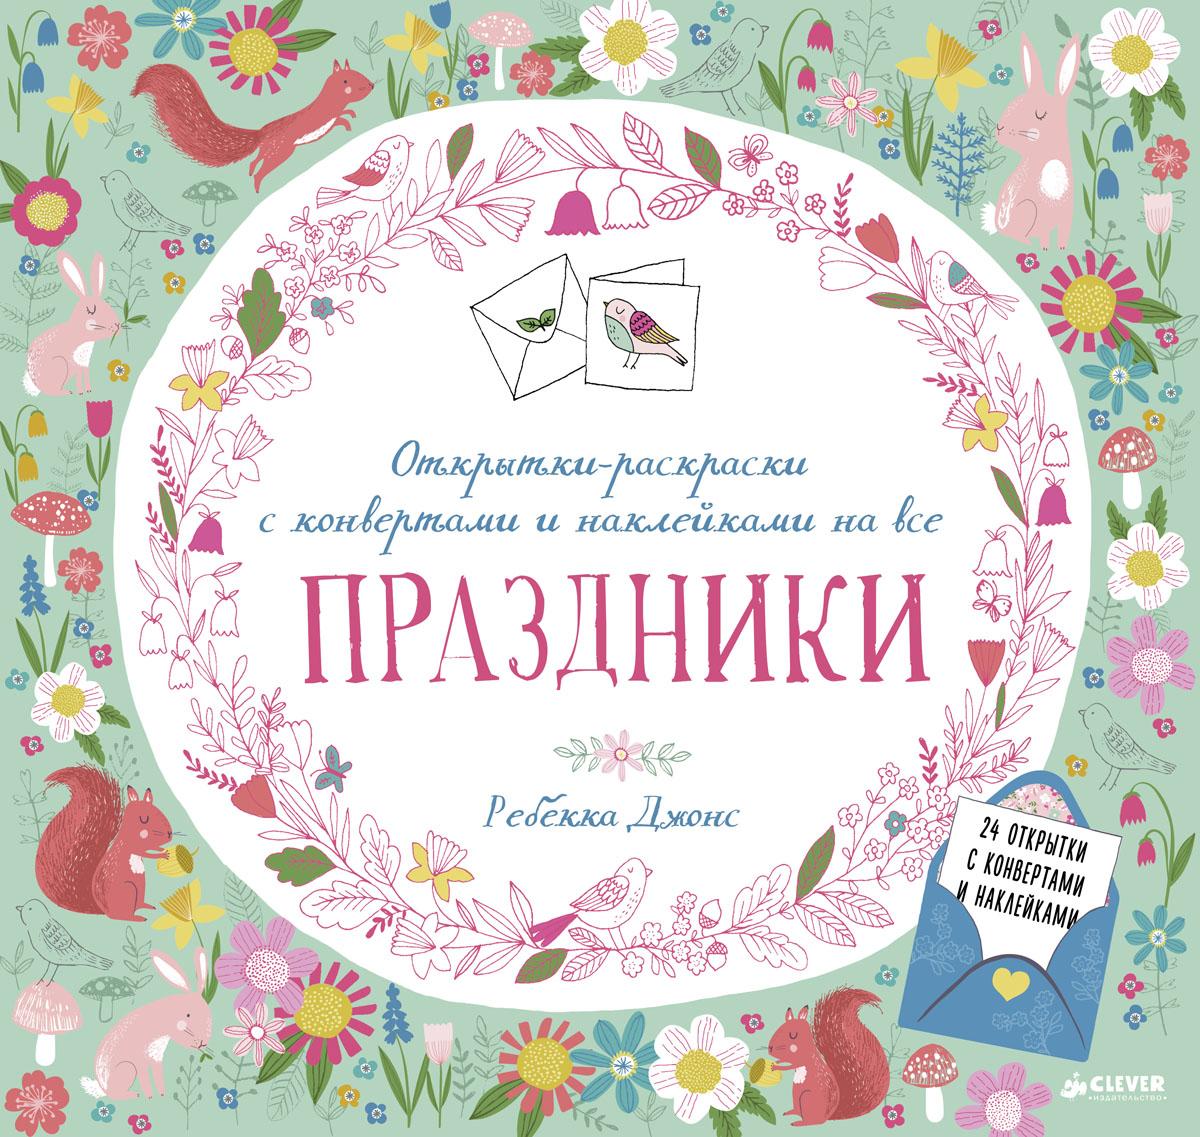 Открытки-раскраски с конвертами и наклейками на все праздники